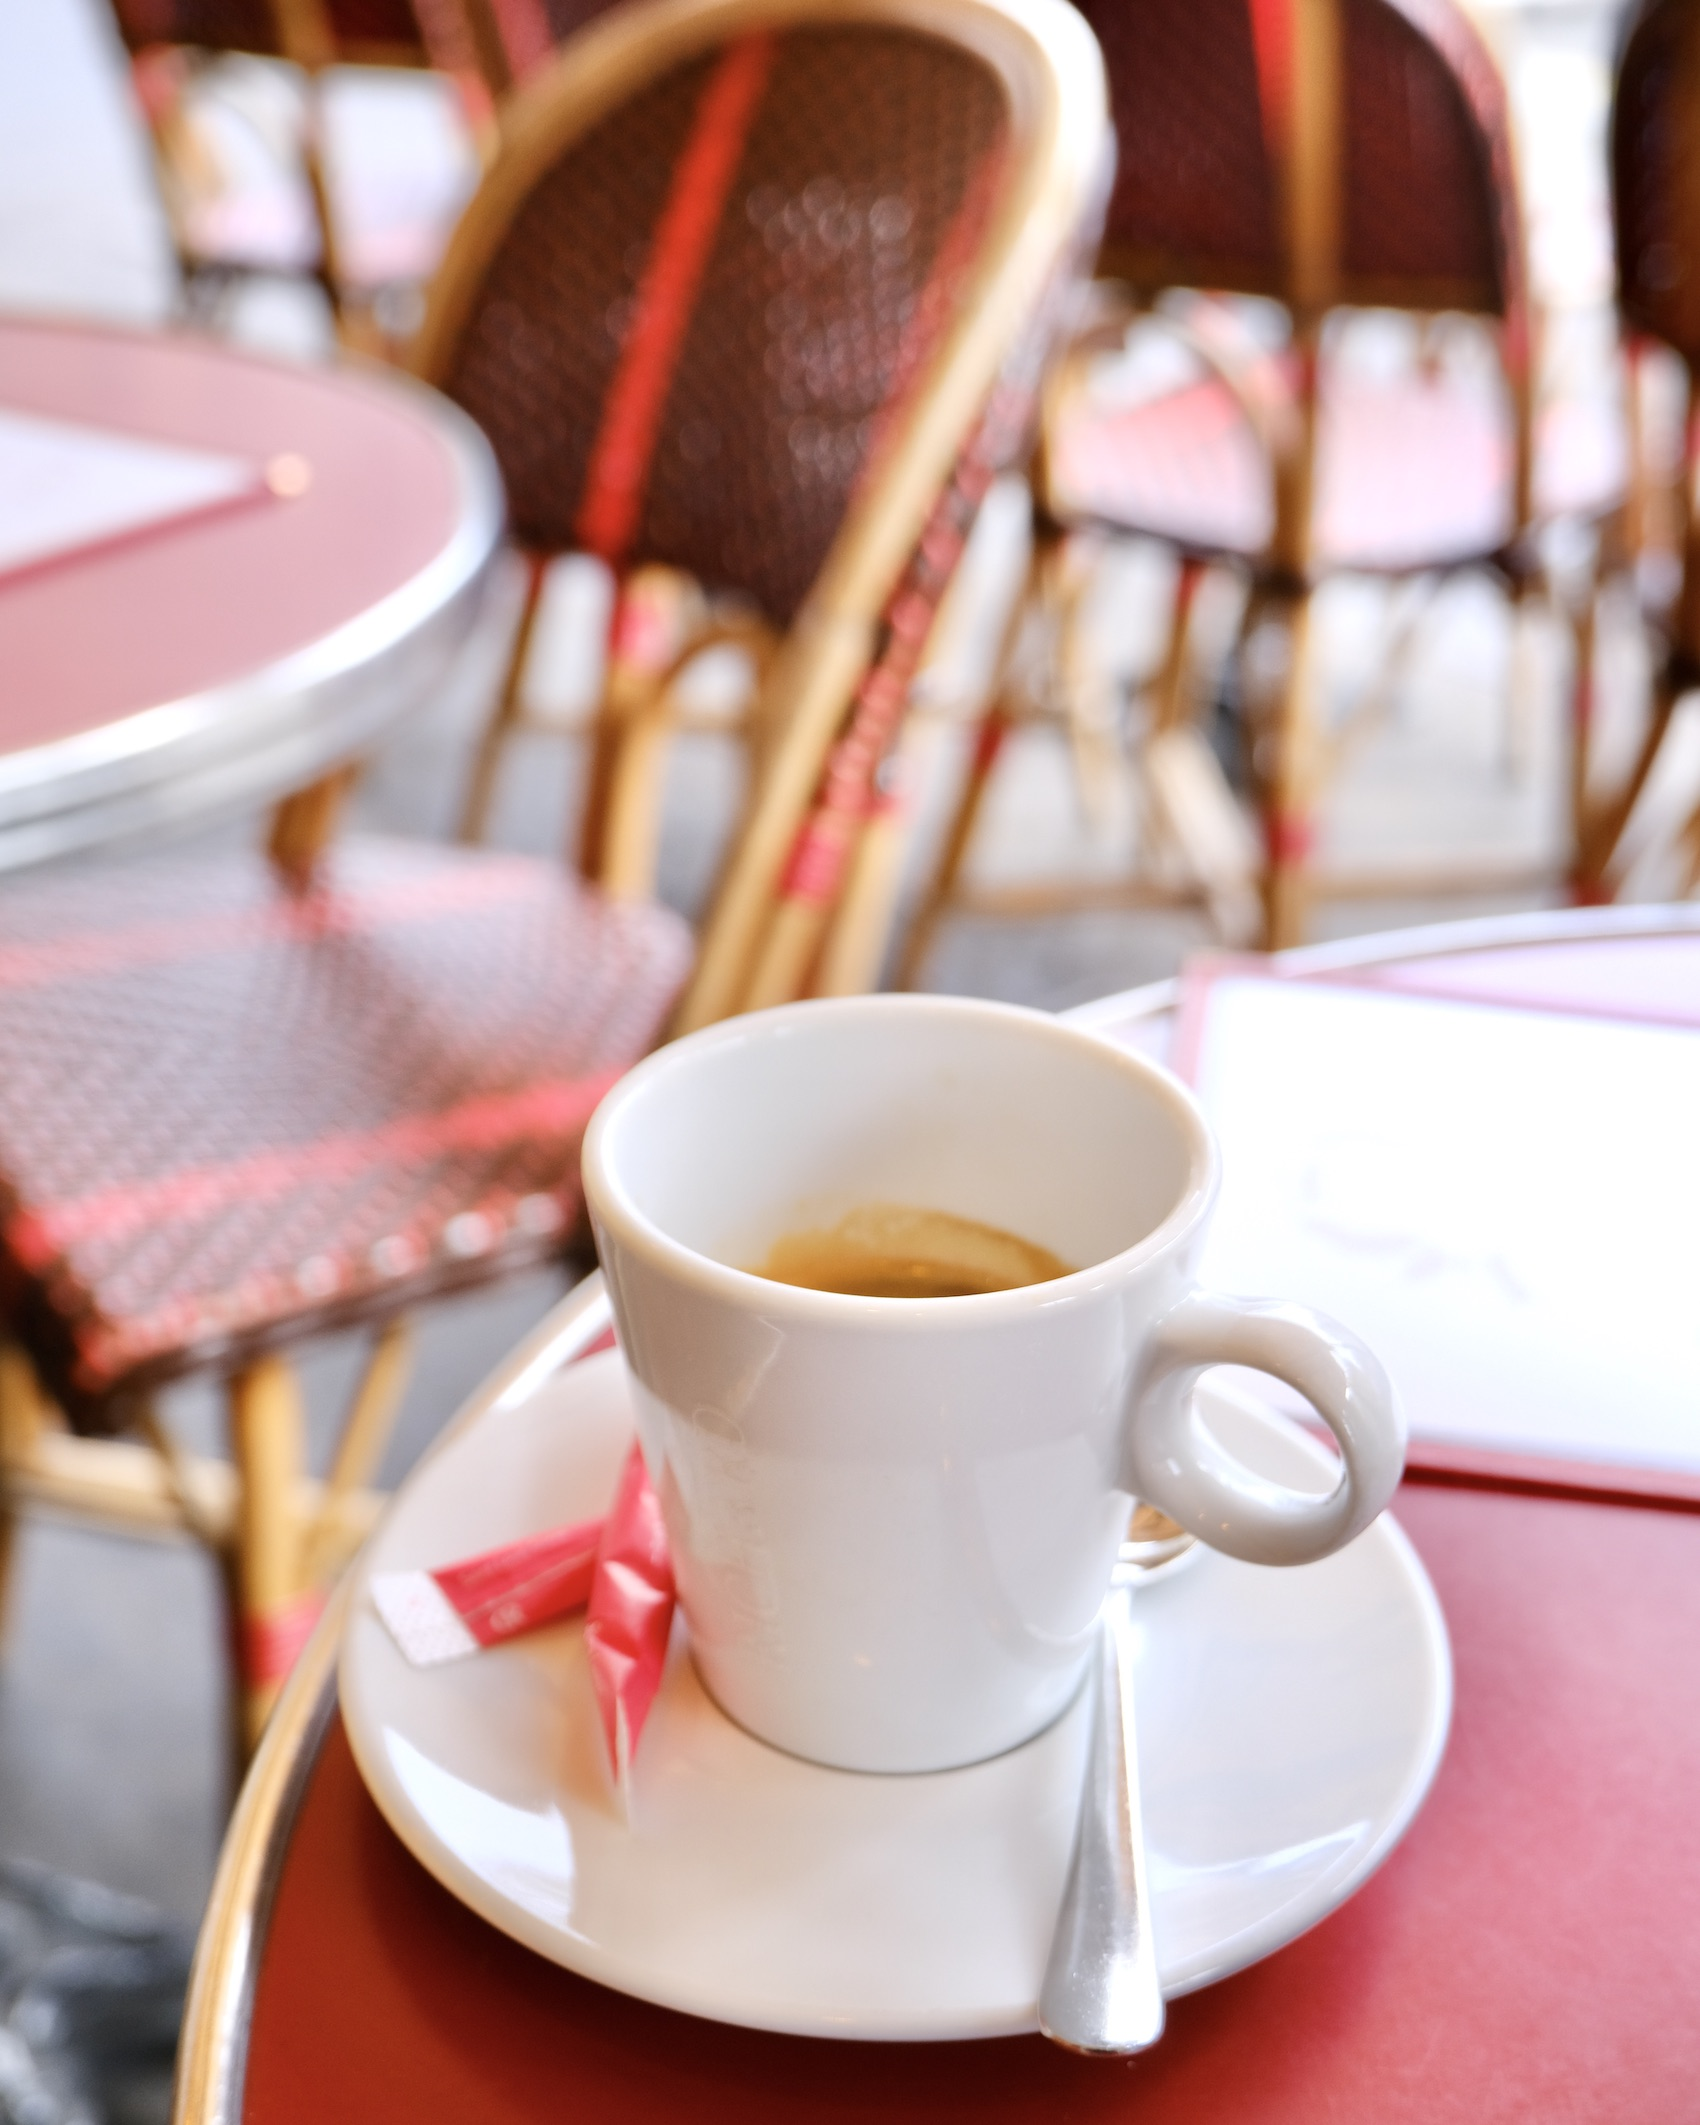 Paris café double espresso